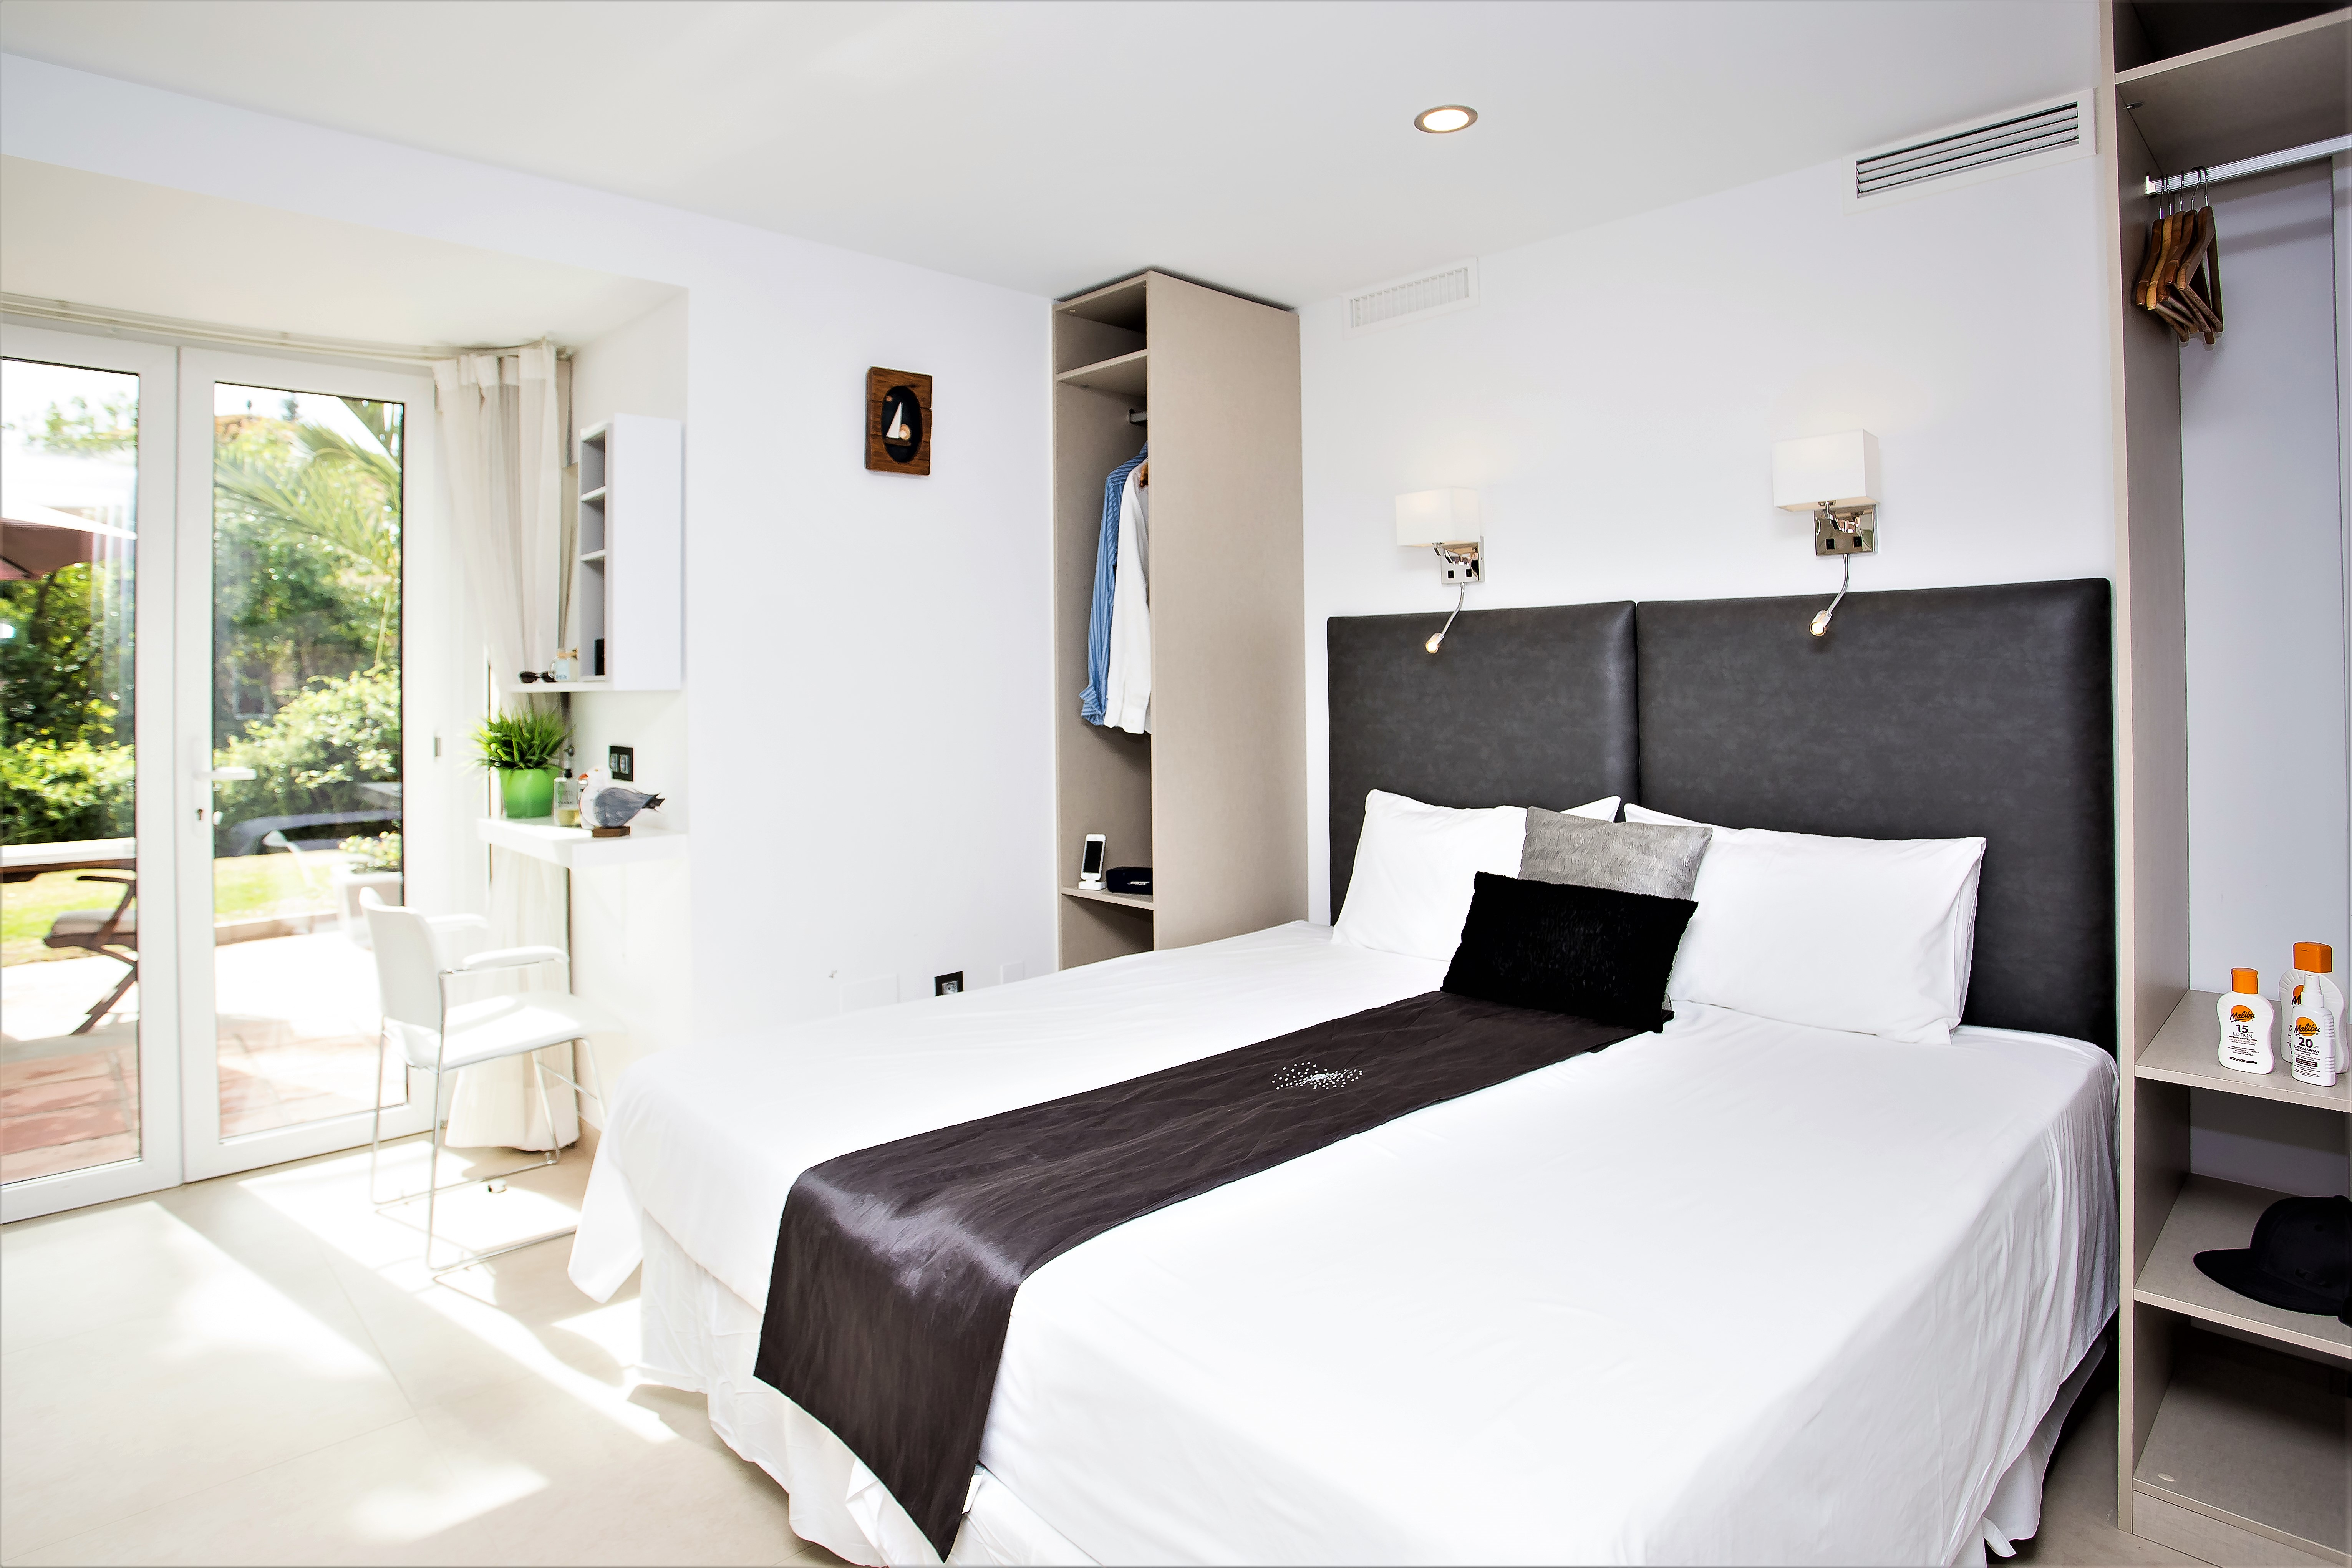 Apartment 8 Bedroom VILLA BY PUERTO BANUS   SEA 5 min                                photo 20341648